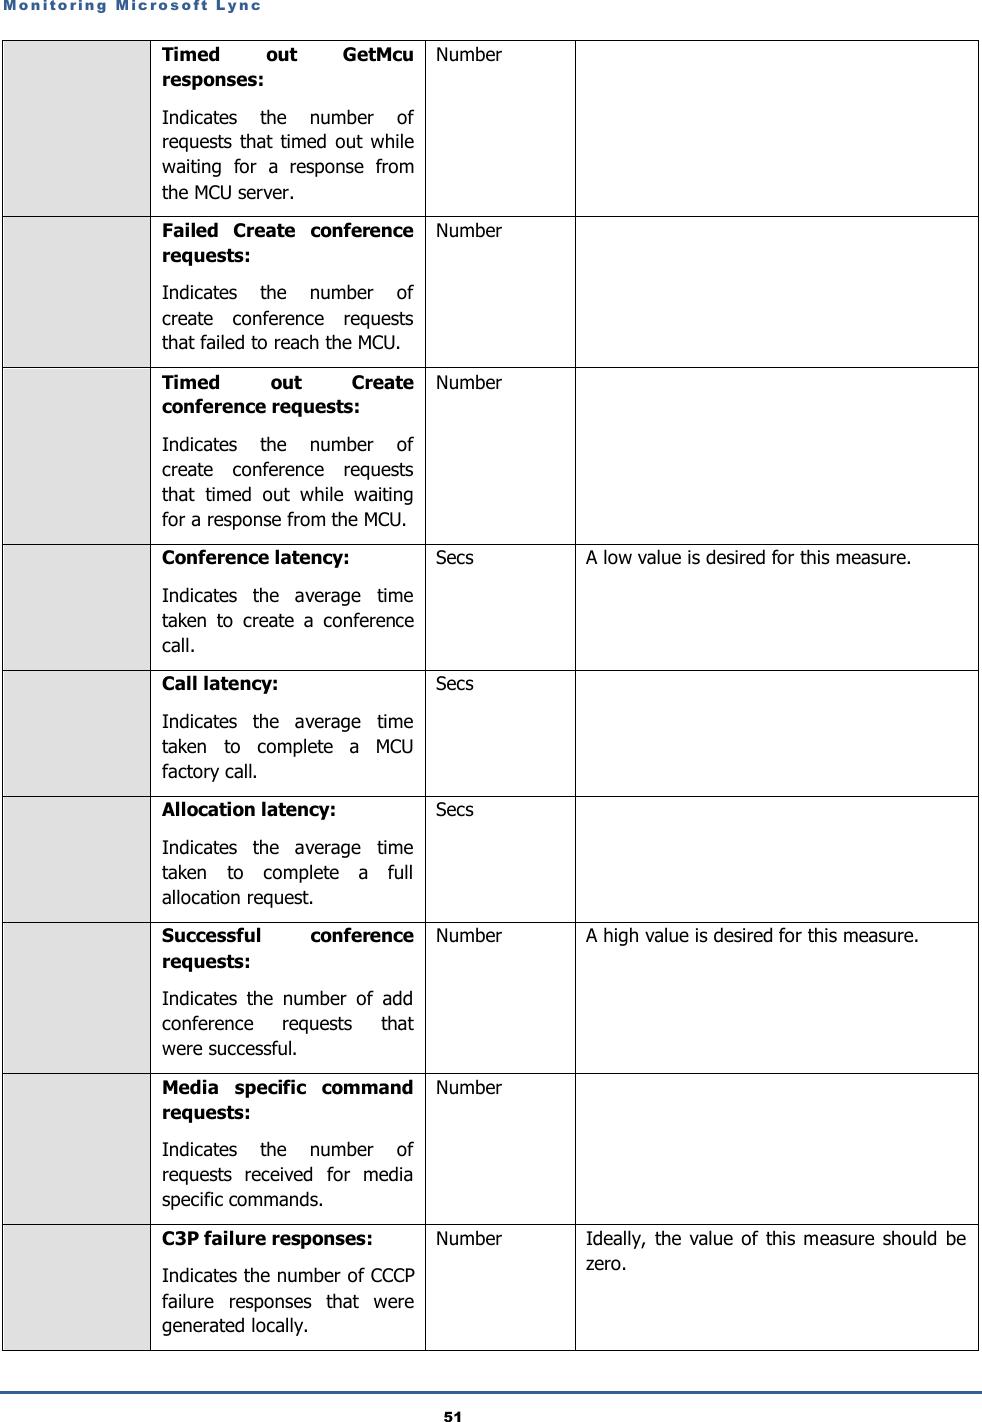 Manual Monitoring Microsoft Lync